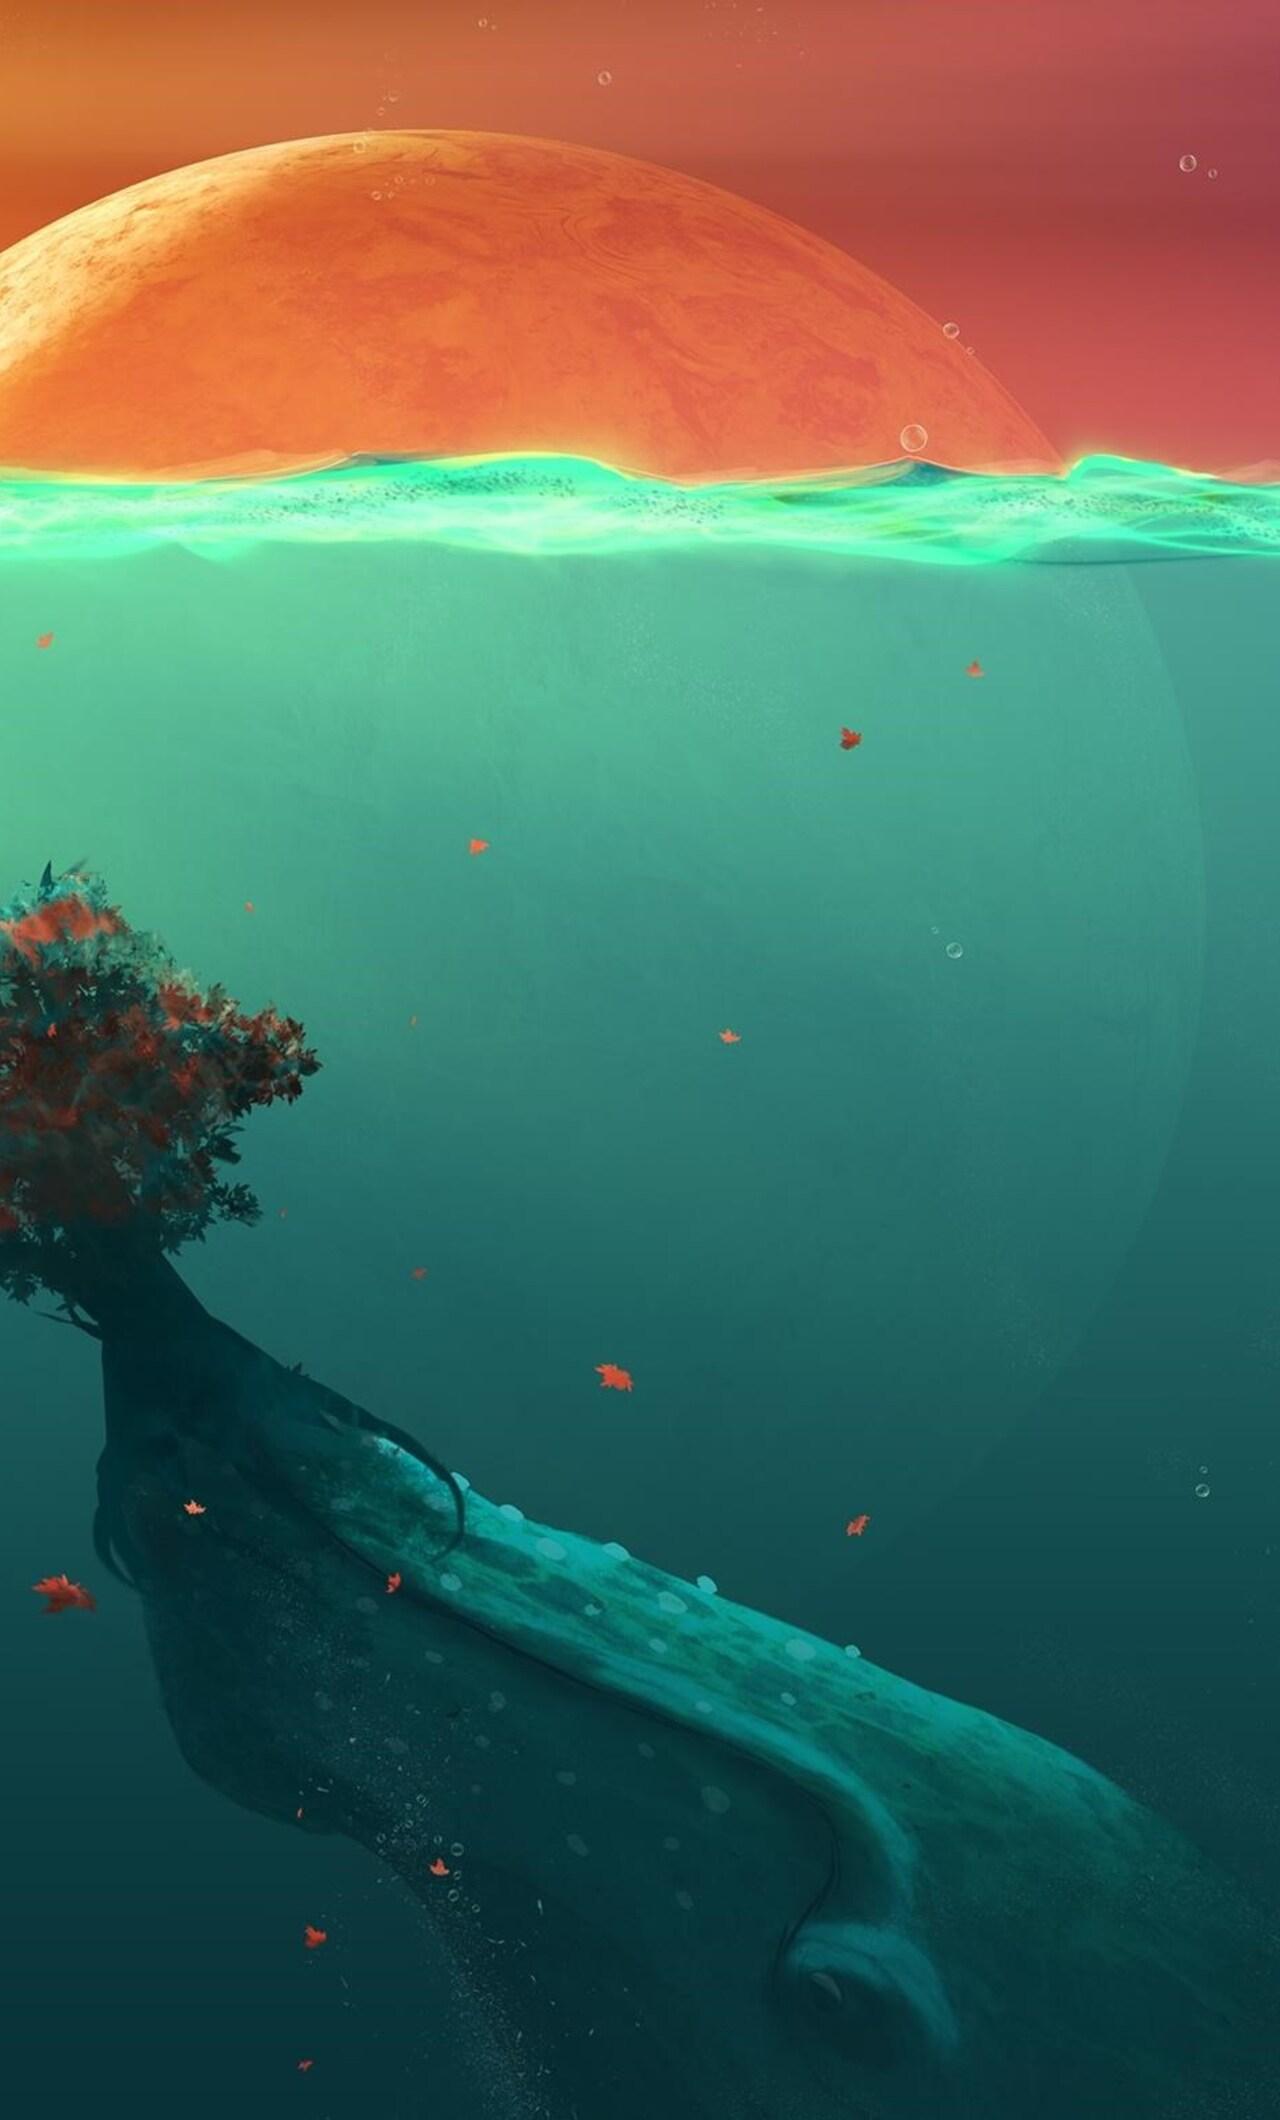 deep-ocean-planet-fish.jpg